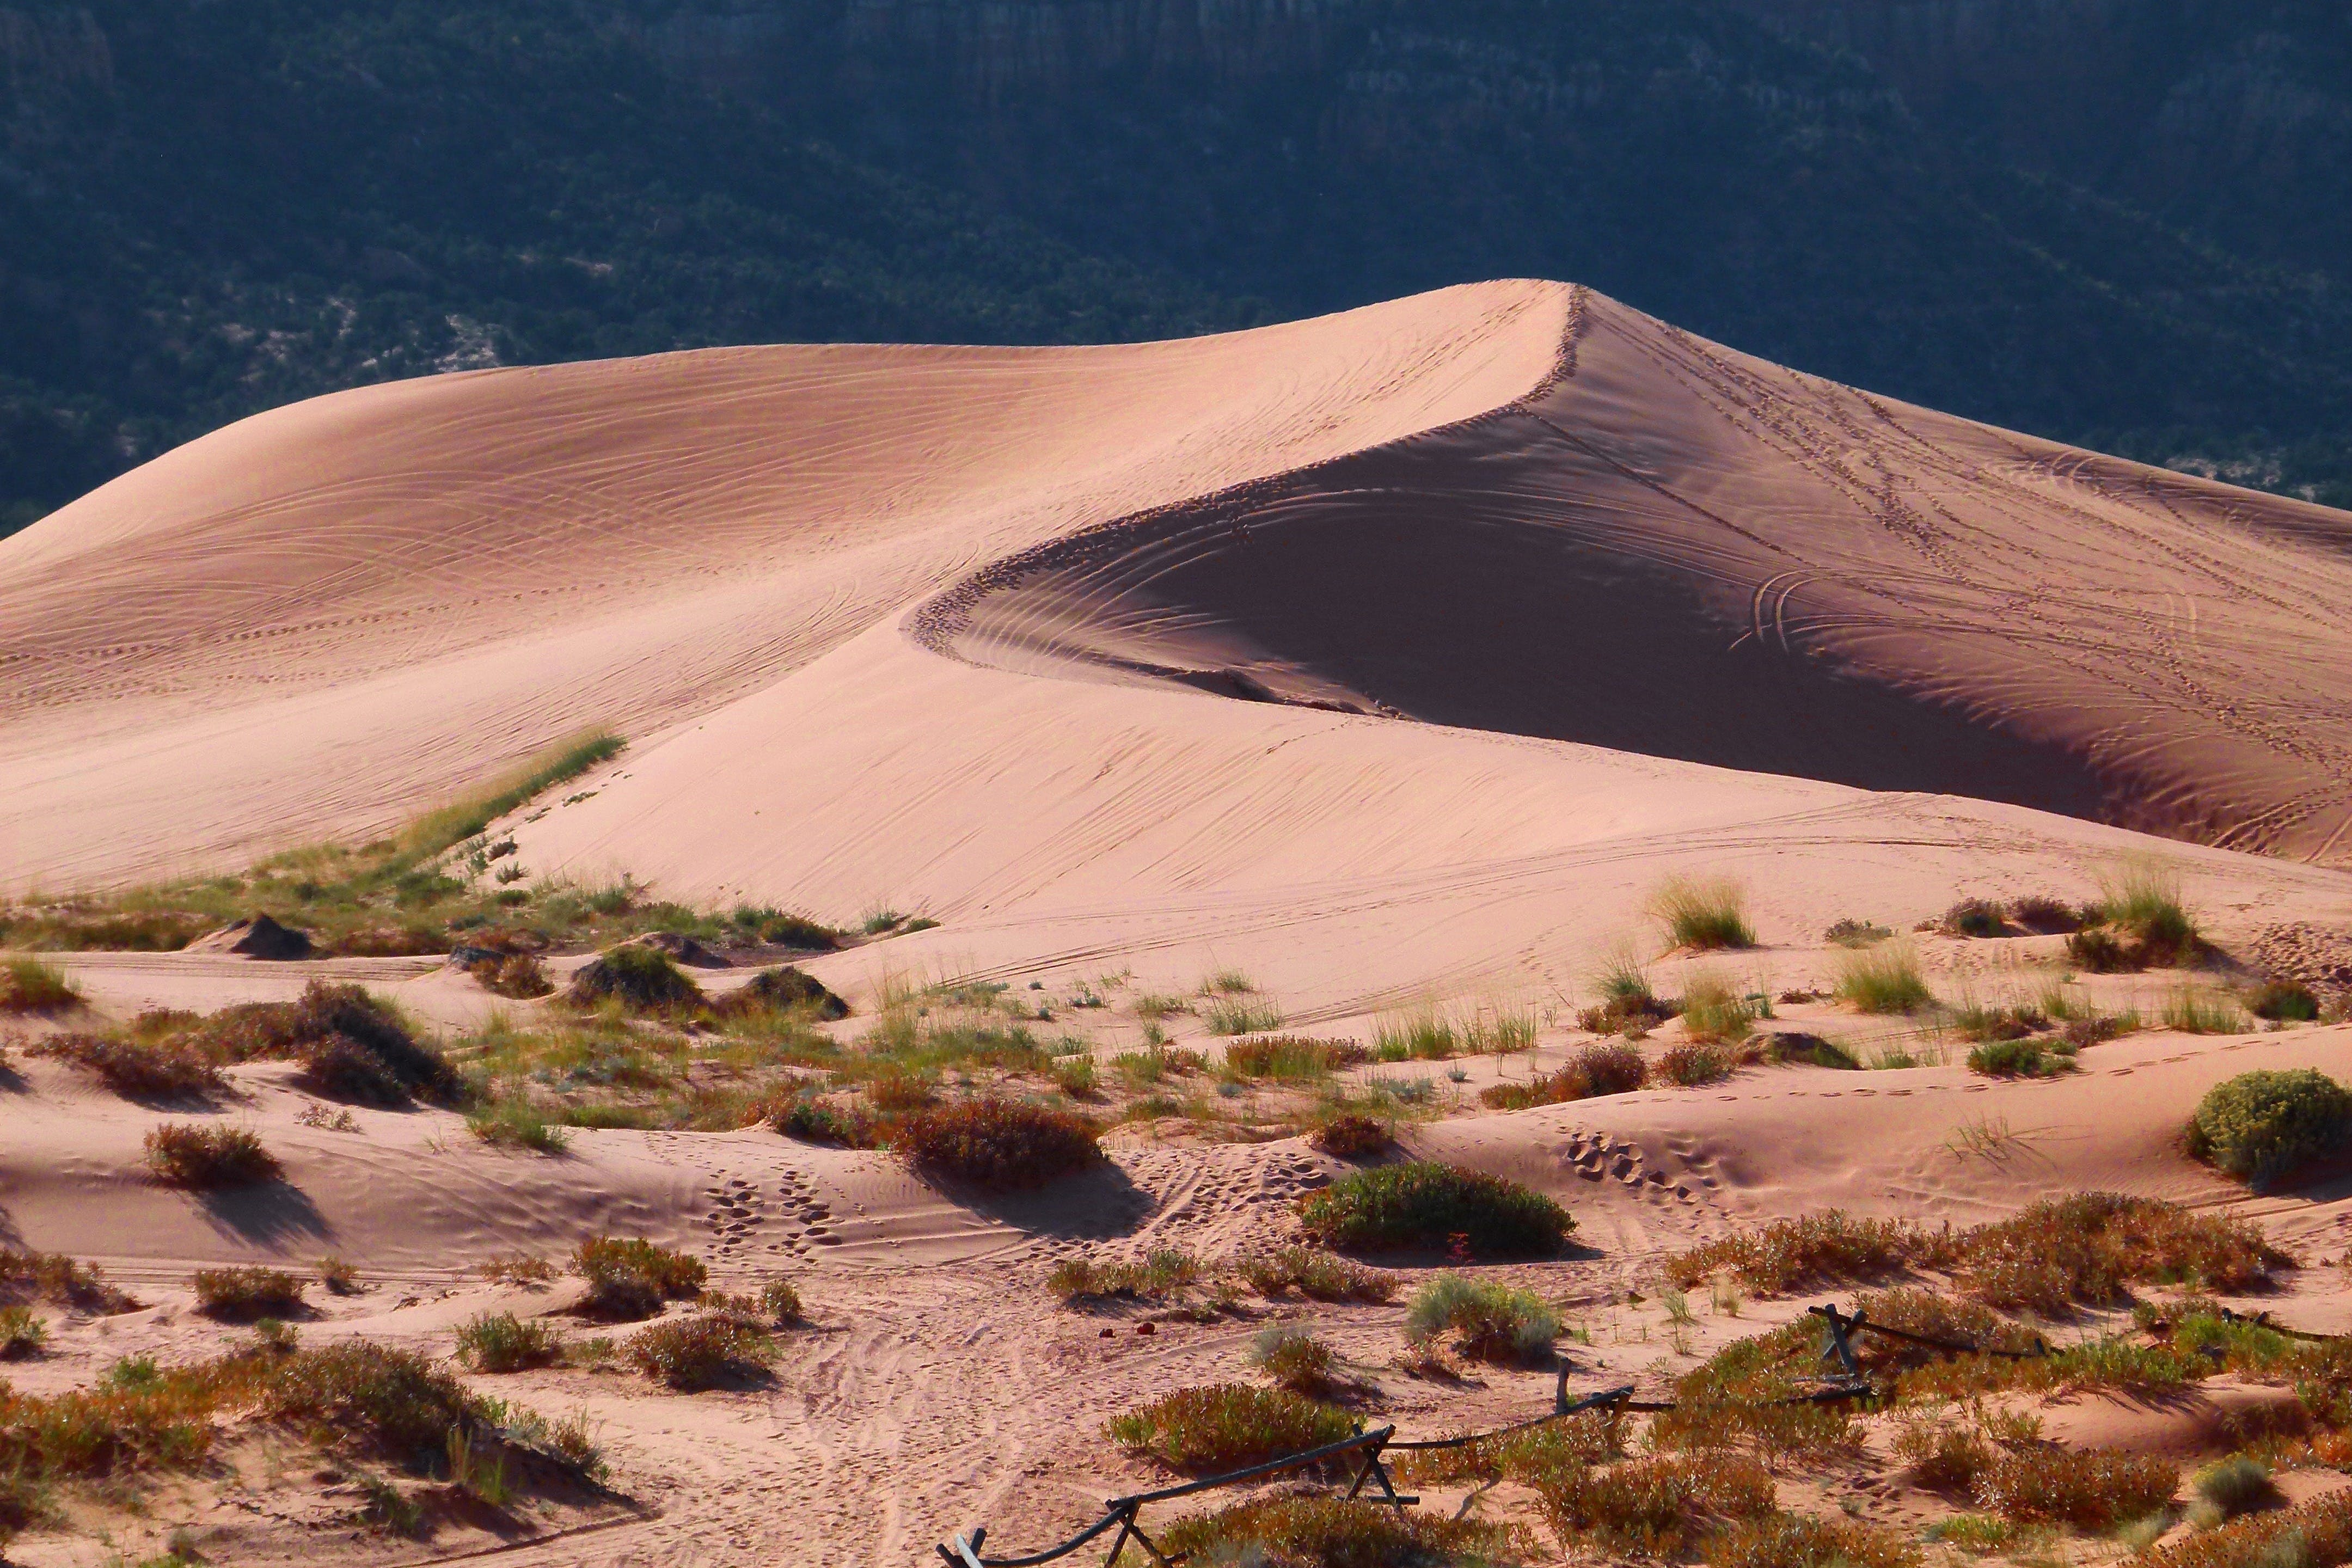 Kostenloses Stock Foto zu dünen, natur, sand, trocken